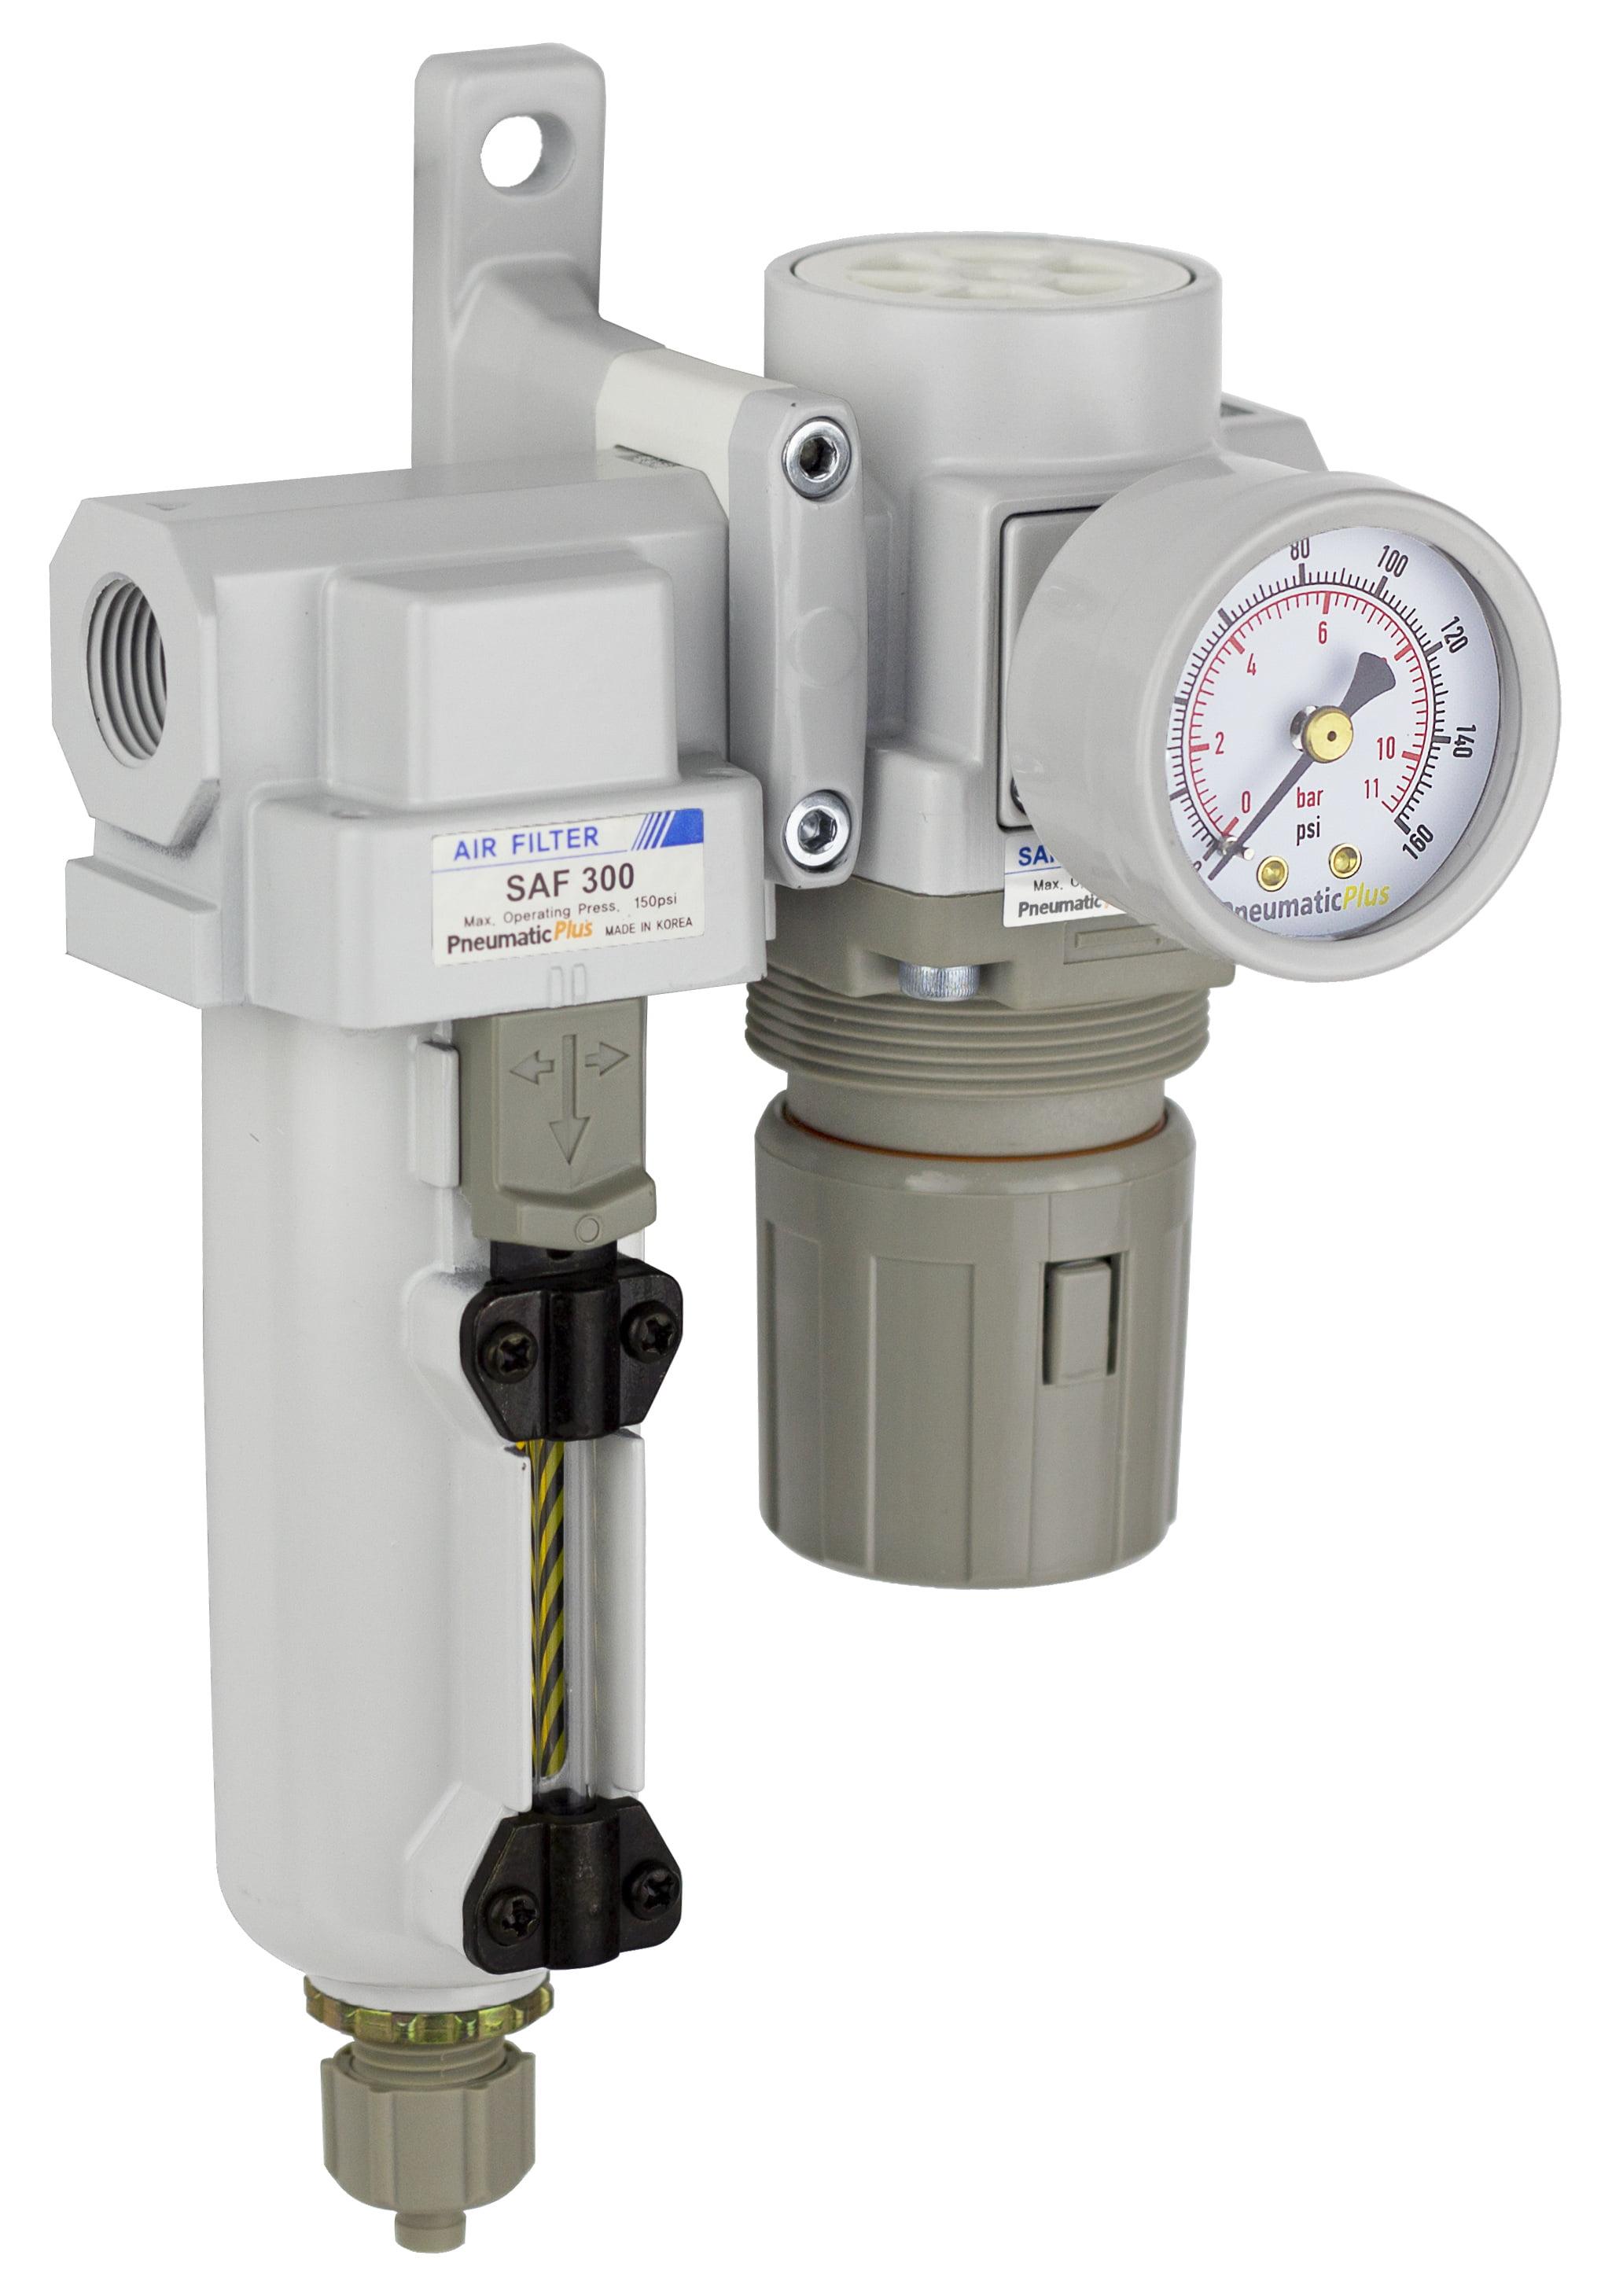 Campbell Hausfeld Filter Regulator 3//8 Inch Air Compressor Part Accessory 90 PSI